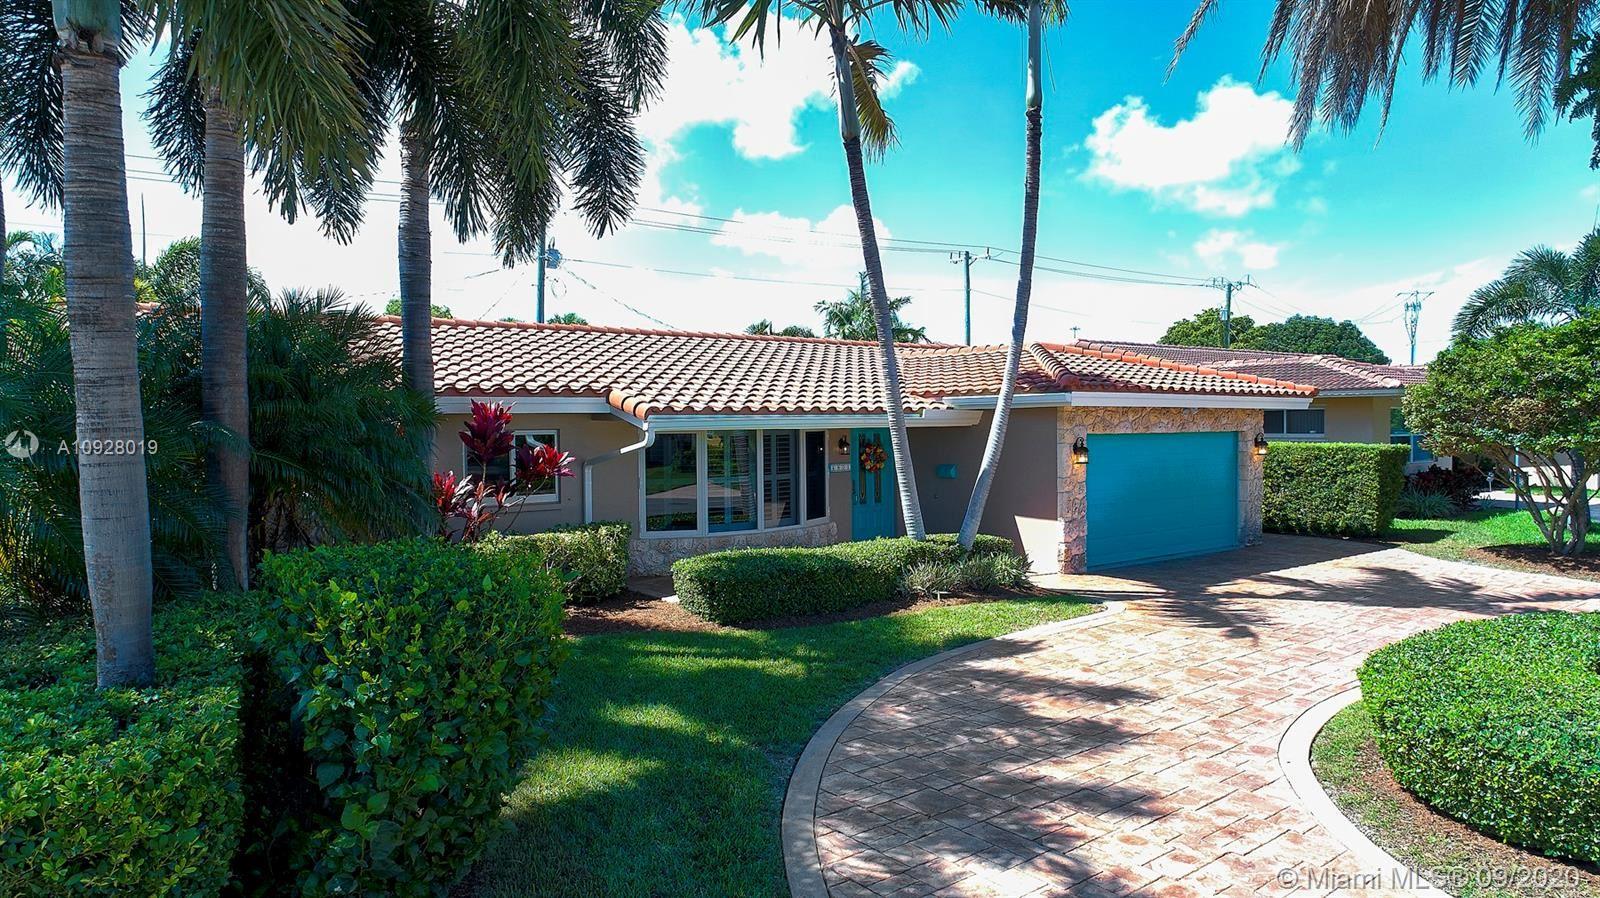 4801 NE 27th Ave, Fort Lauderdale, FL 33308 - #: A10928019